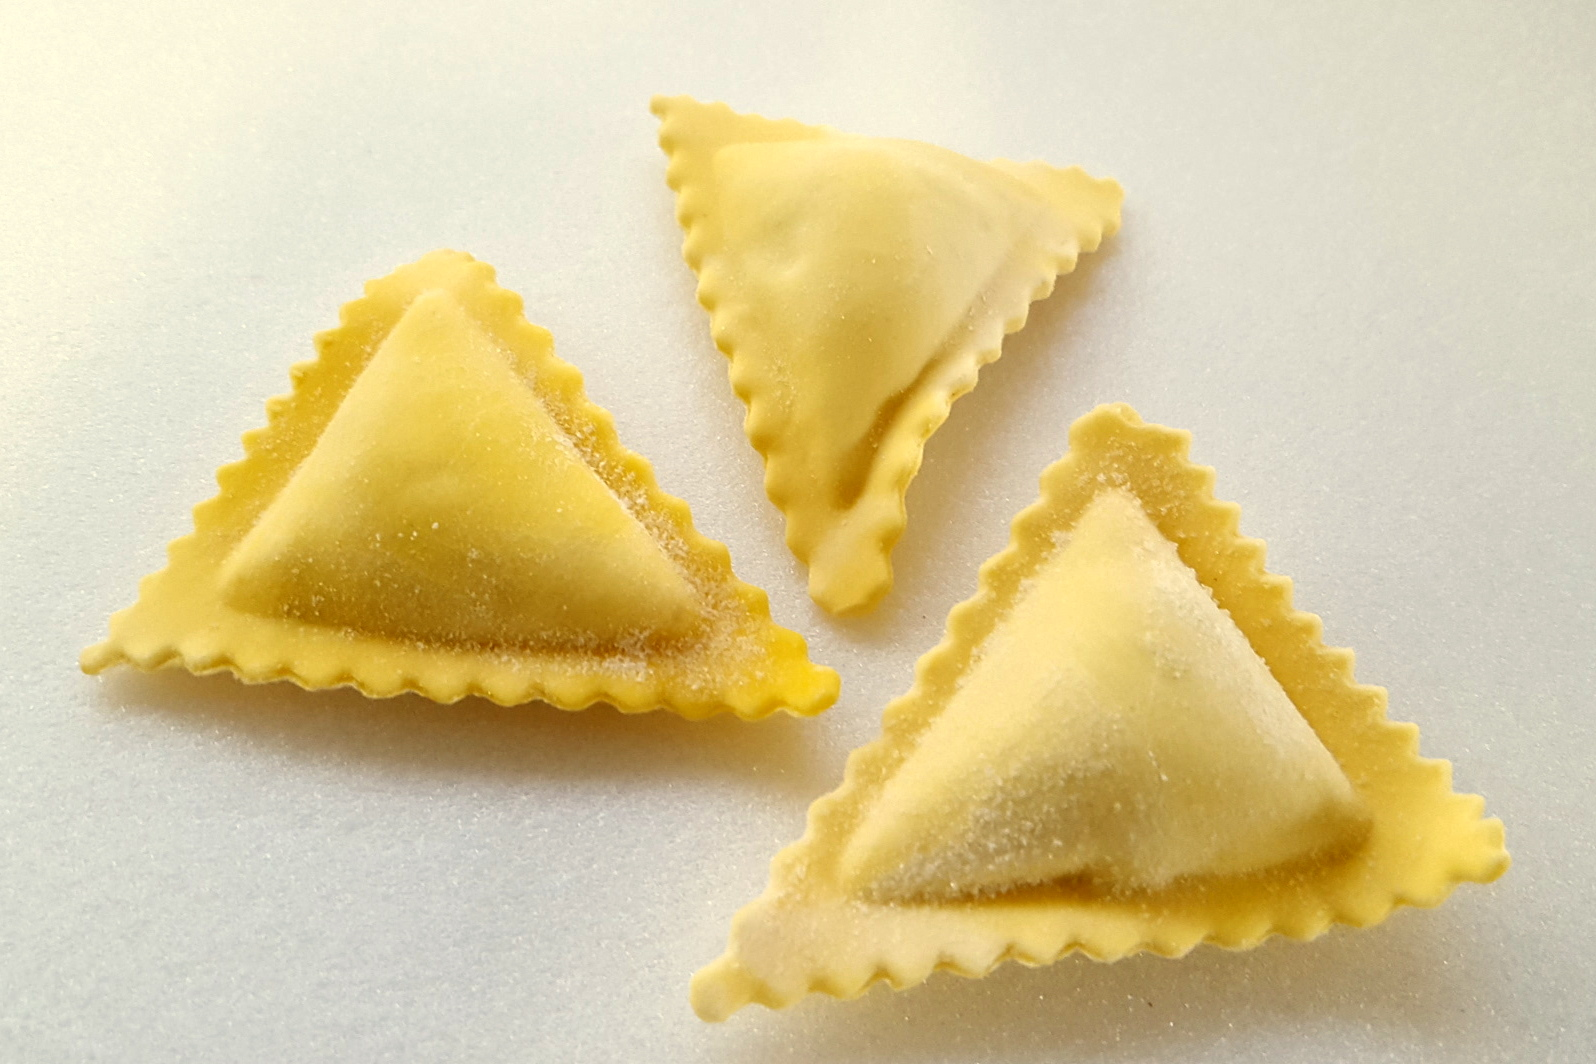 ravioli-pesce-pastificio-franceschi-viareggio-2